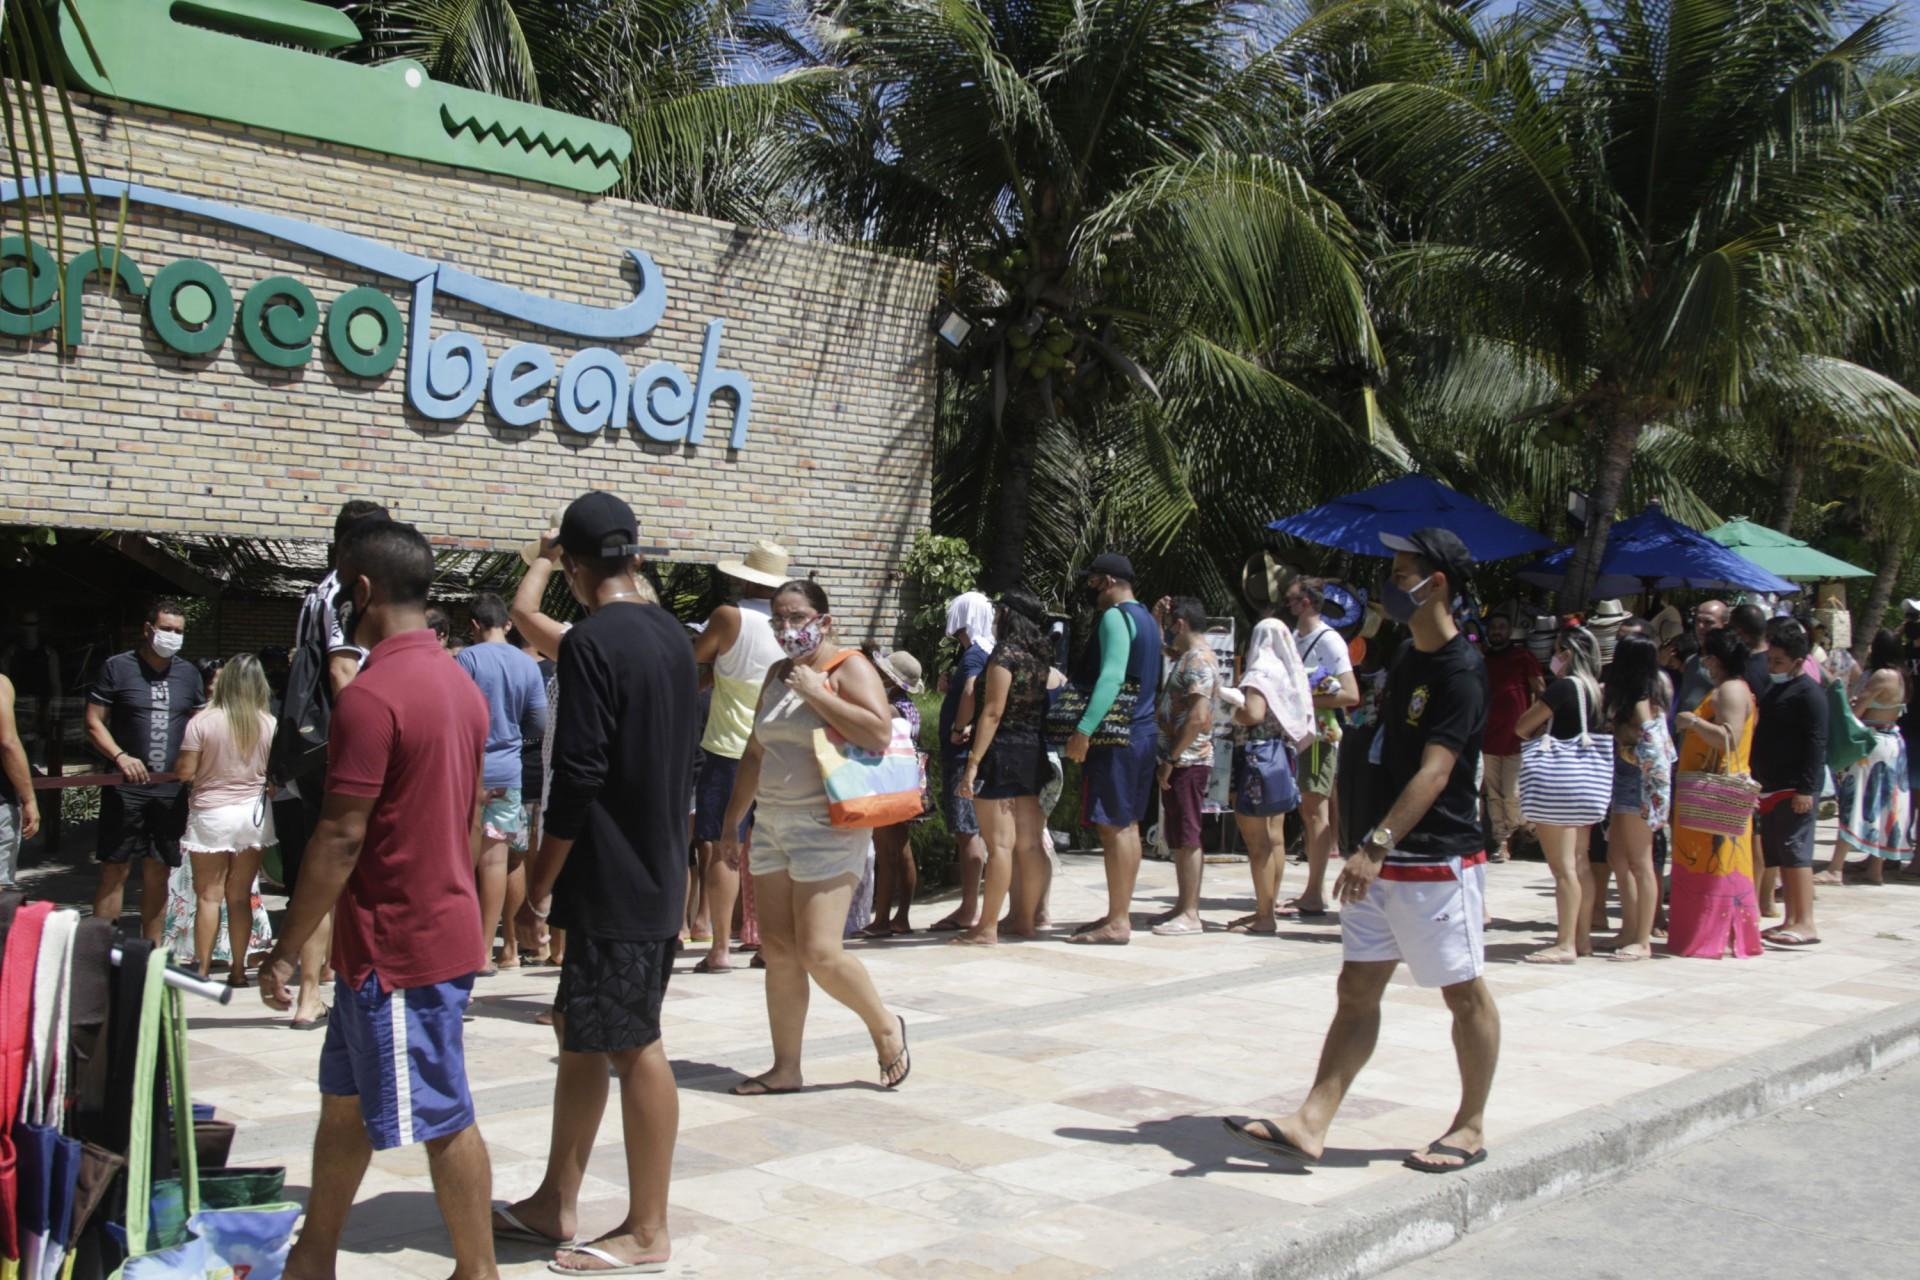 (Foto: Thais Mesquita)FORTALEZA, CE, BRASIL, 01.01.2021: Movimentacao nas barracas da praia do futuro, no primeiro dia do ano foi intenso. (Foto: Thais Mesquita/O POVO)